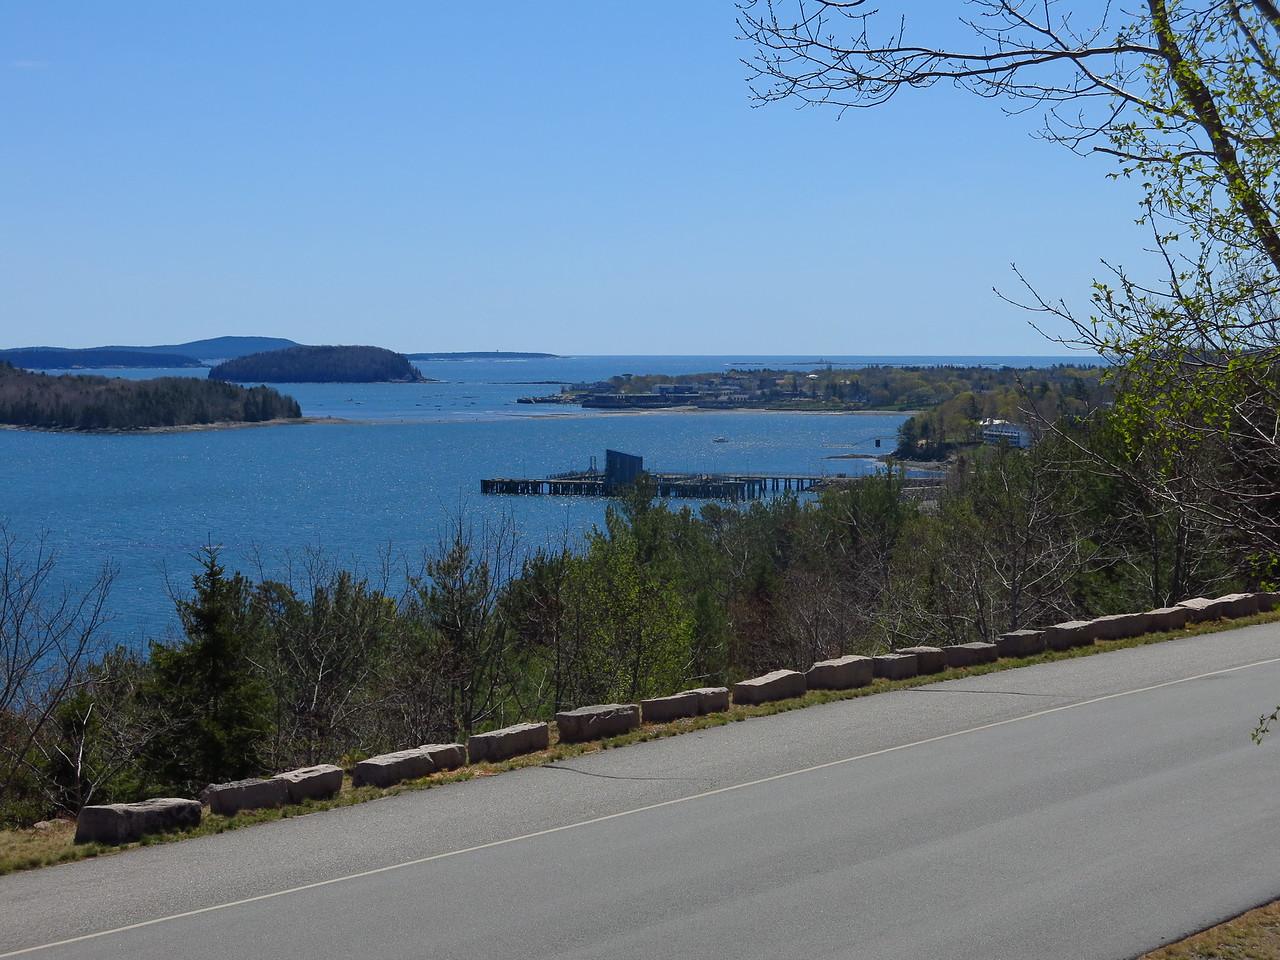 2016-05-10 Acadia (8)